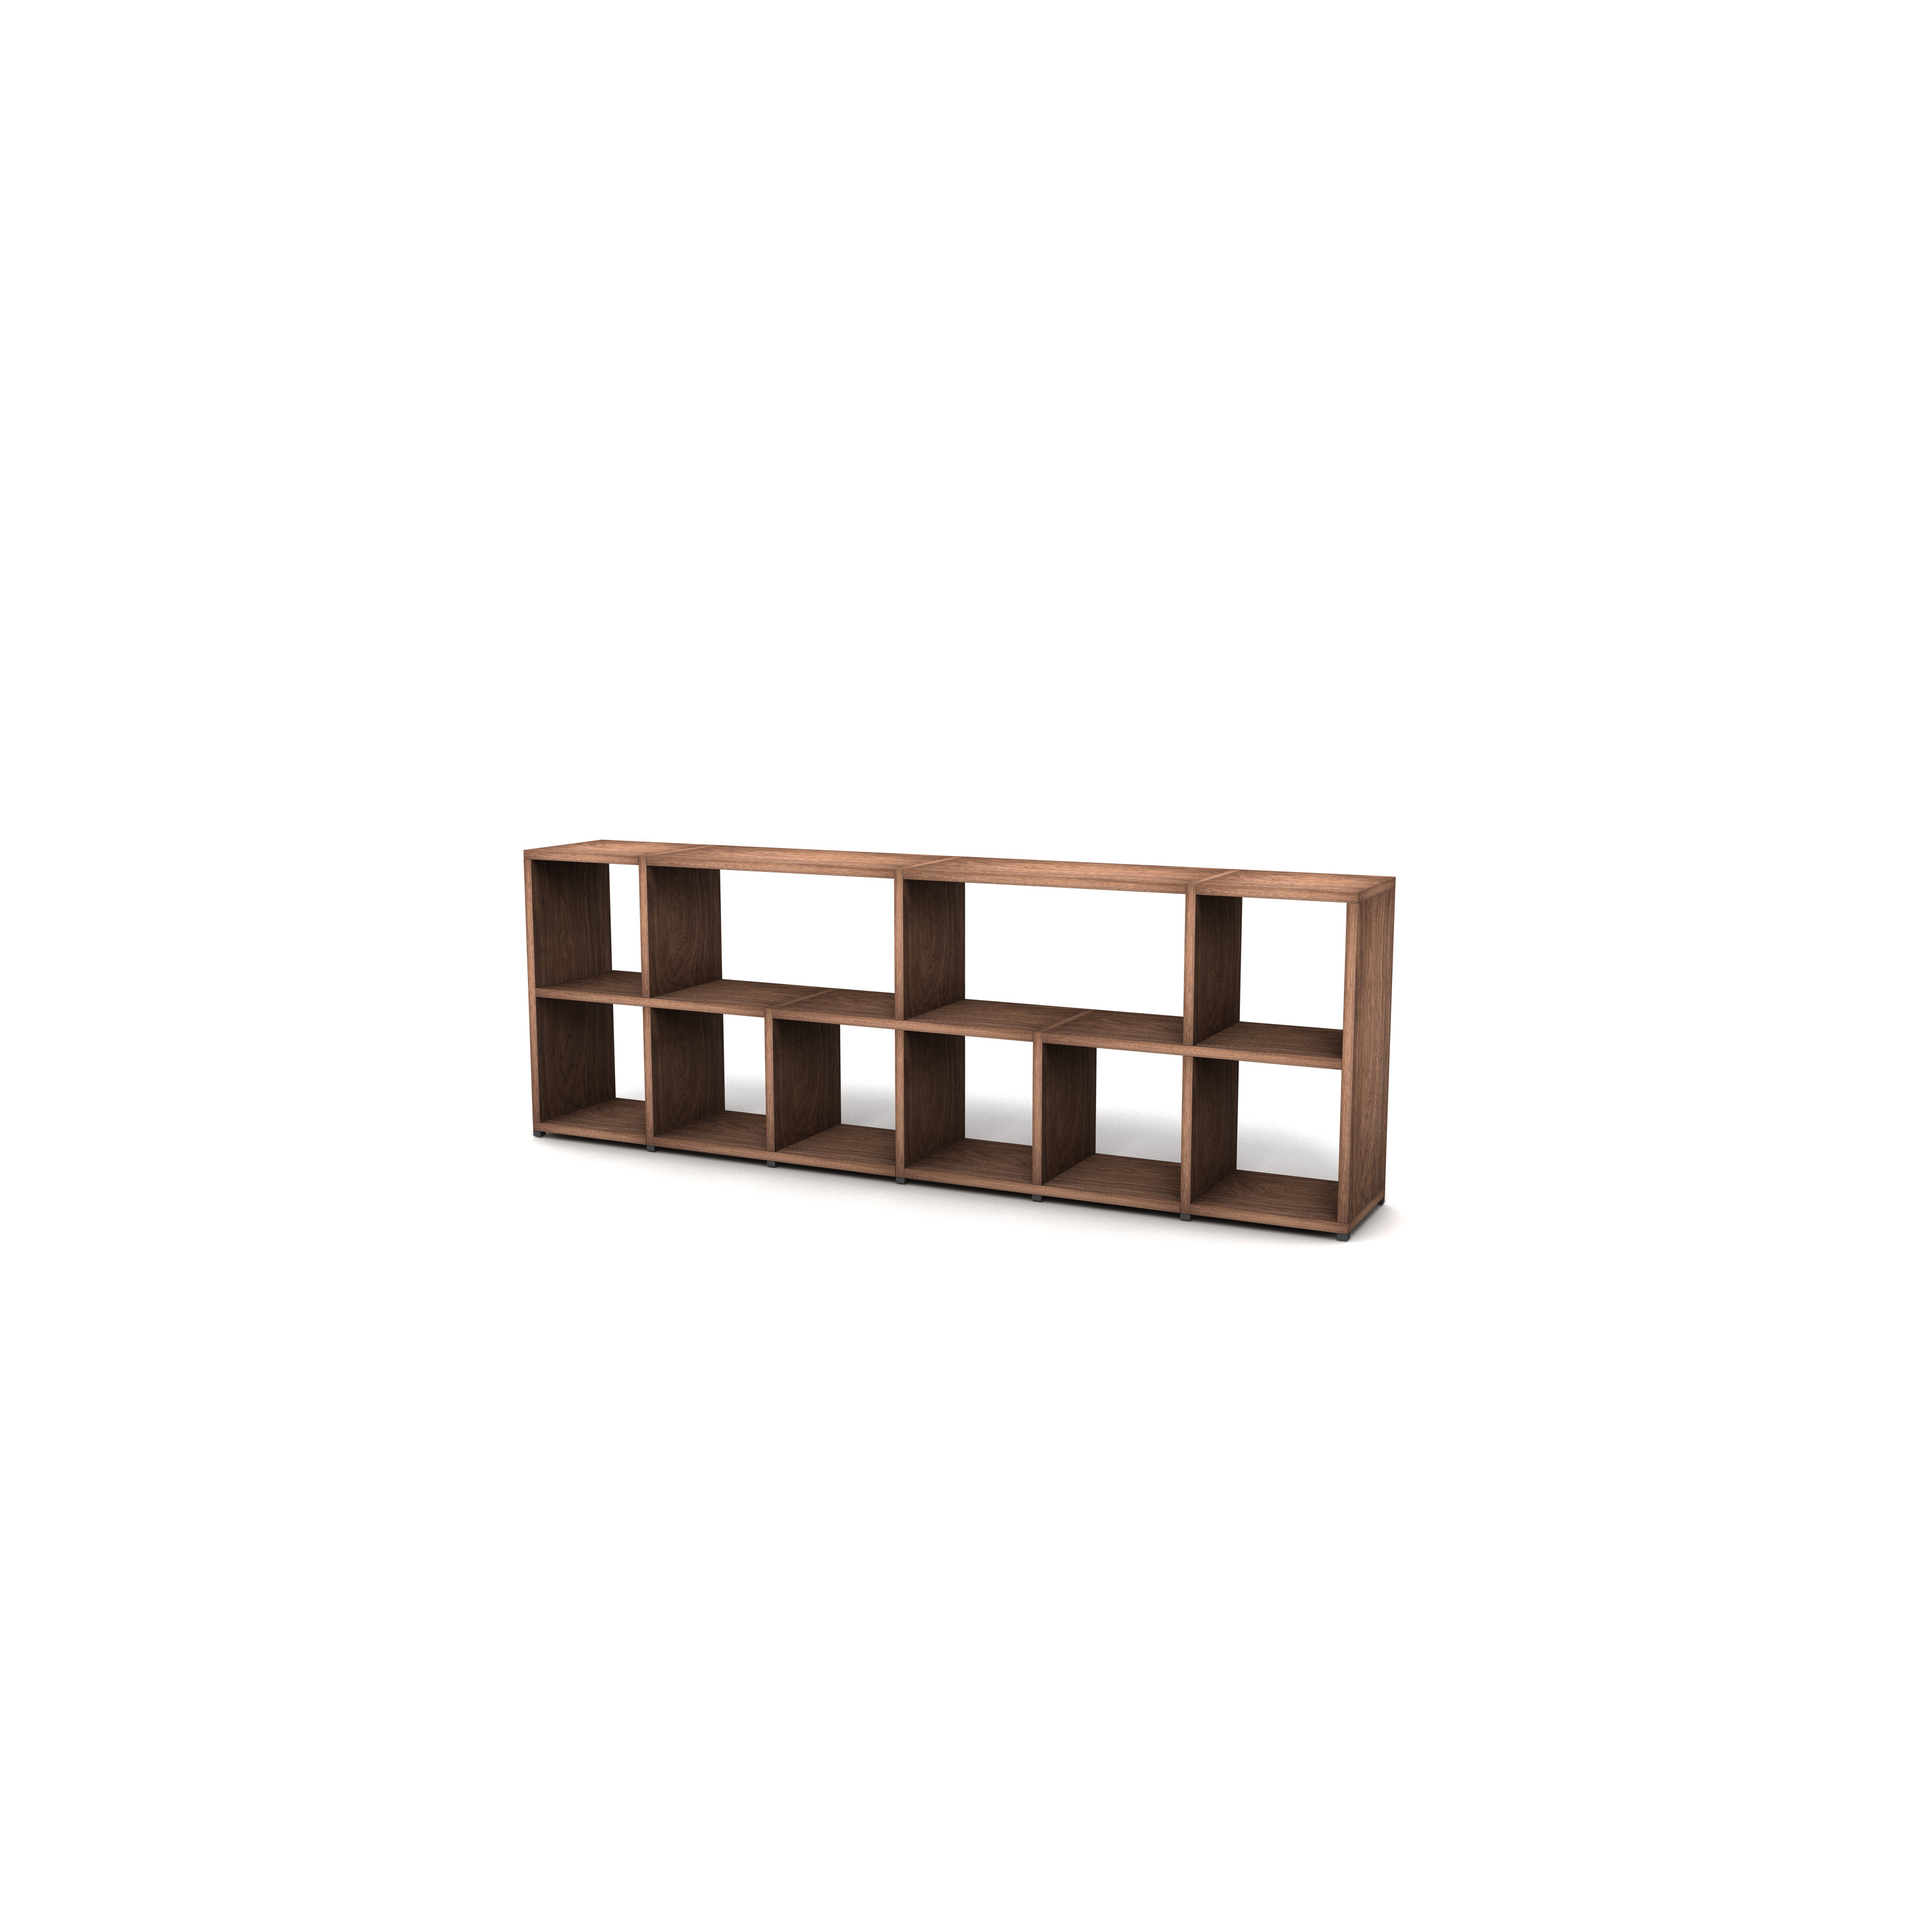 Shelving System 355 Version 1 | Walnut Wood